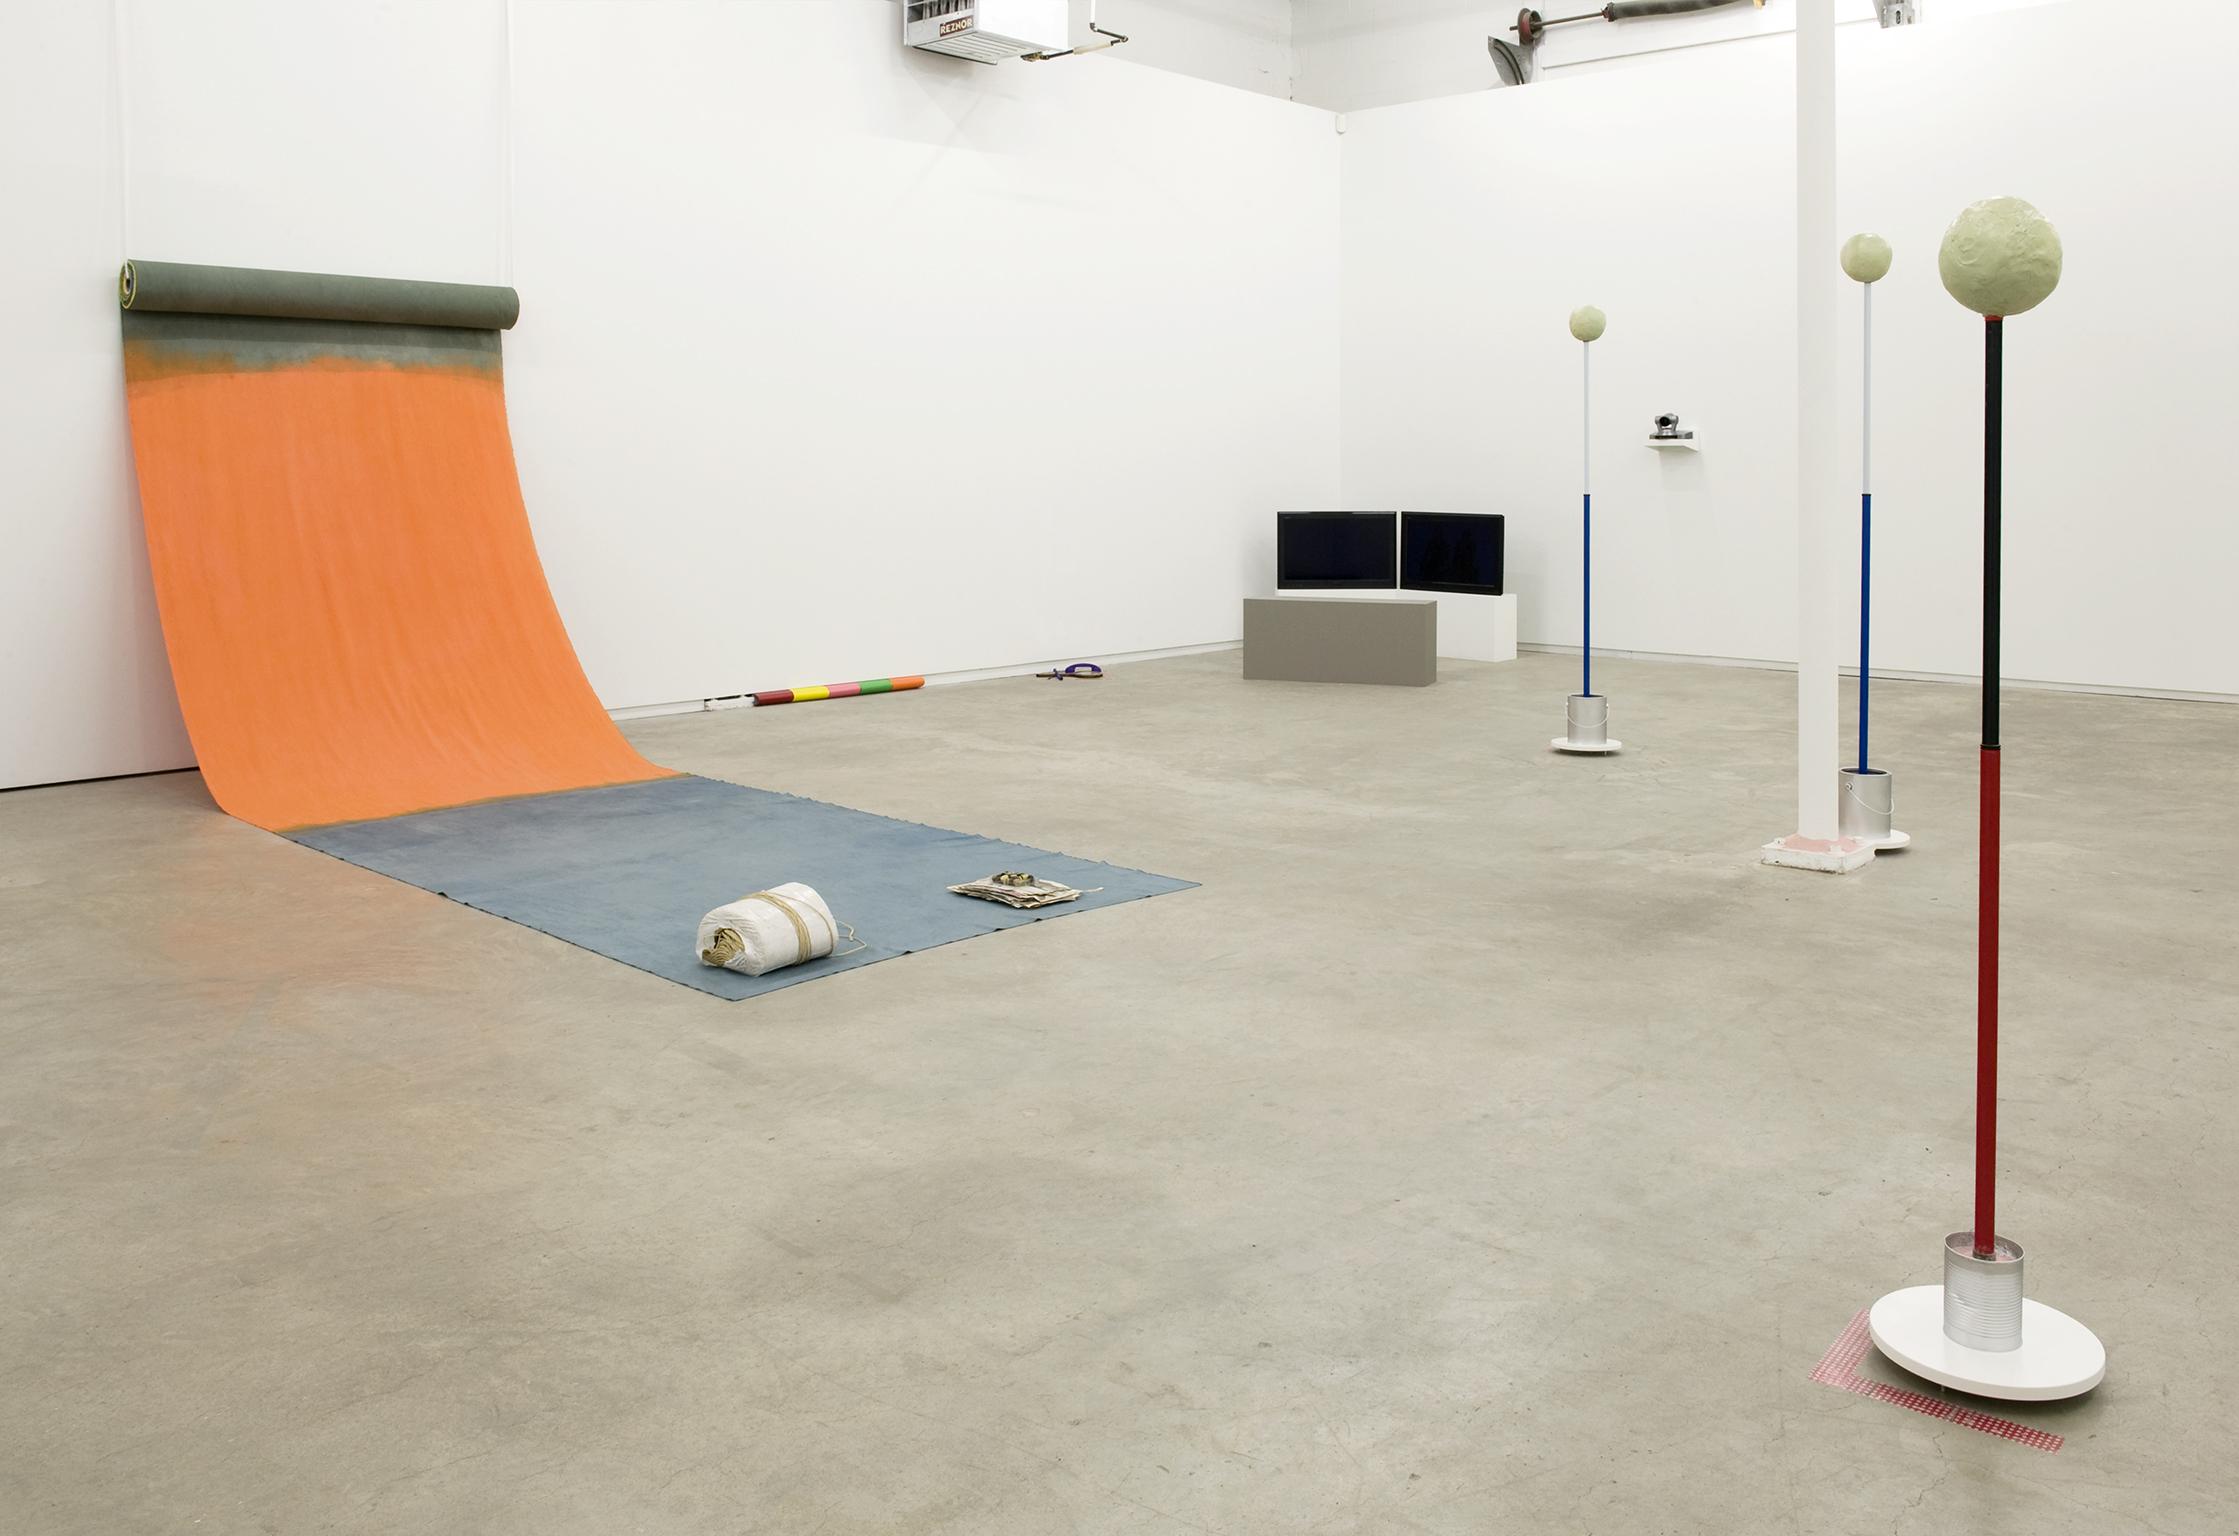 Ulla von Brandenburg, Guy de Cointet, Geoffrey Farmer, Janice Kerbel, Daria Martin, Judy Radul, installation view, People Things Enter Exit, 2011 by